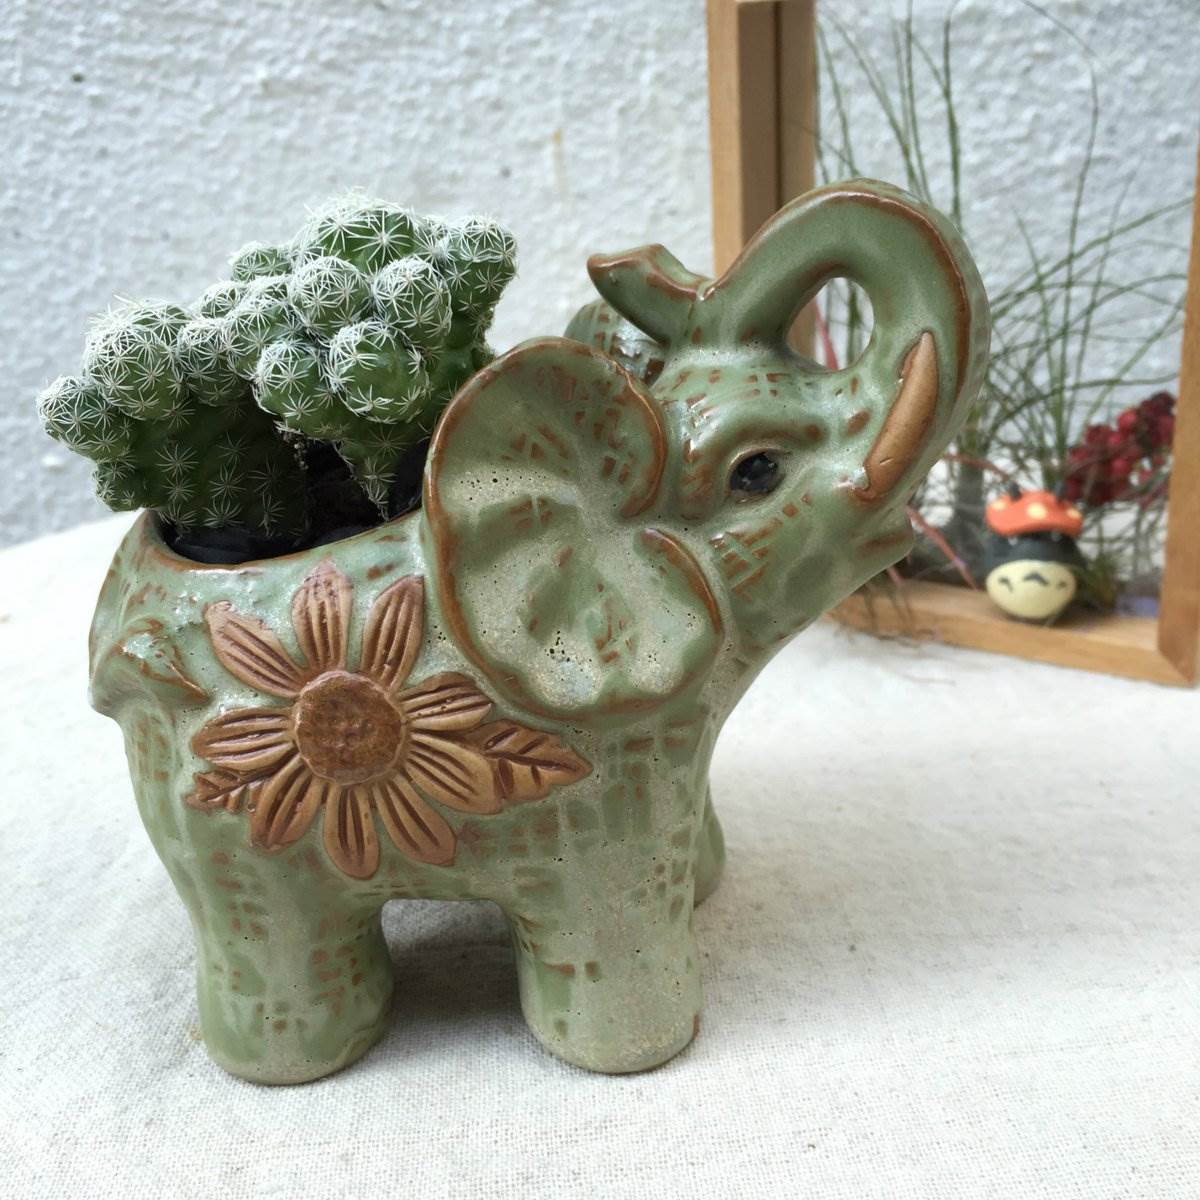 small animal ceramic elephant flower pots planter cacti. Black Bedroom Furniture Sets. Home Design Ideas